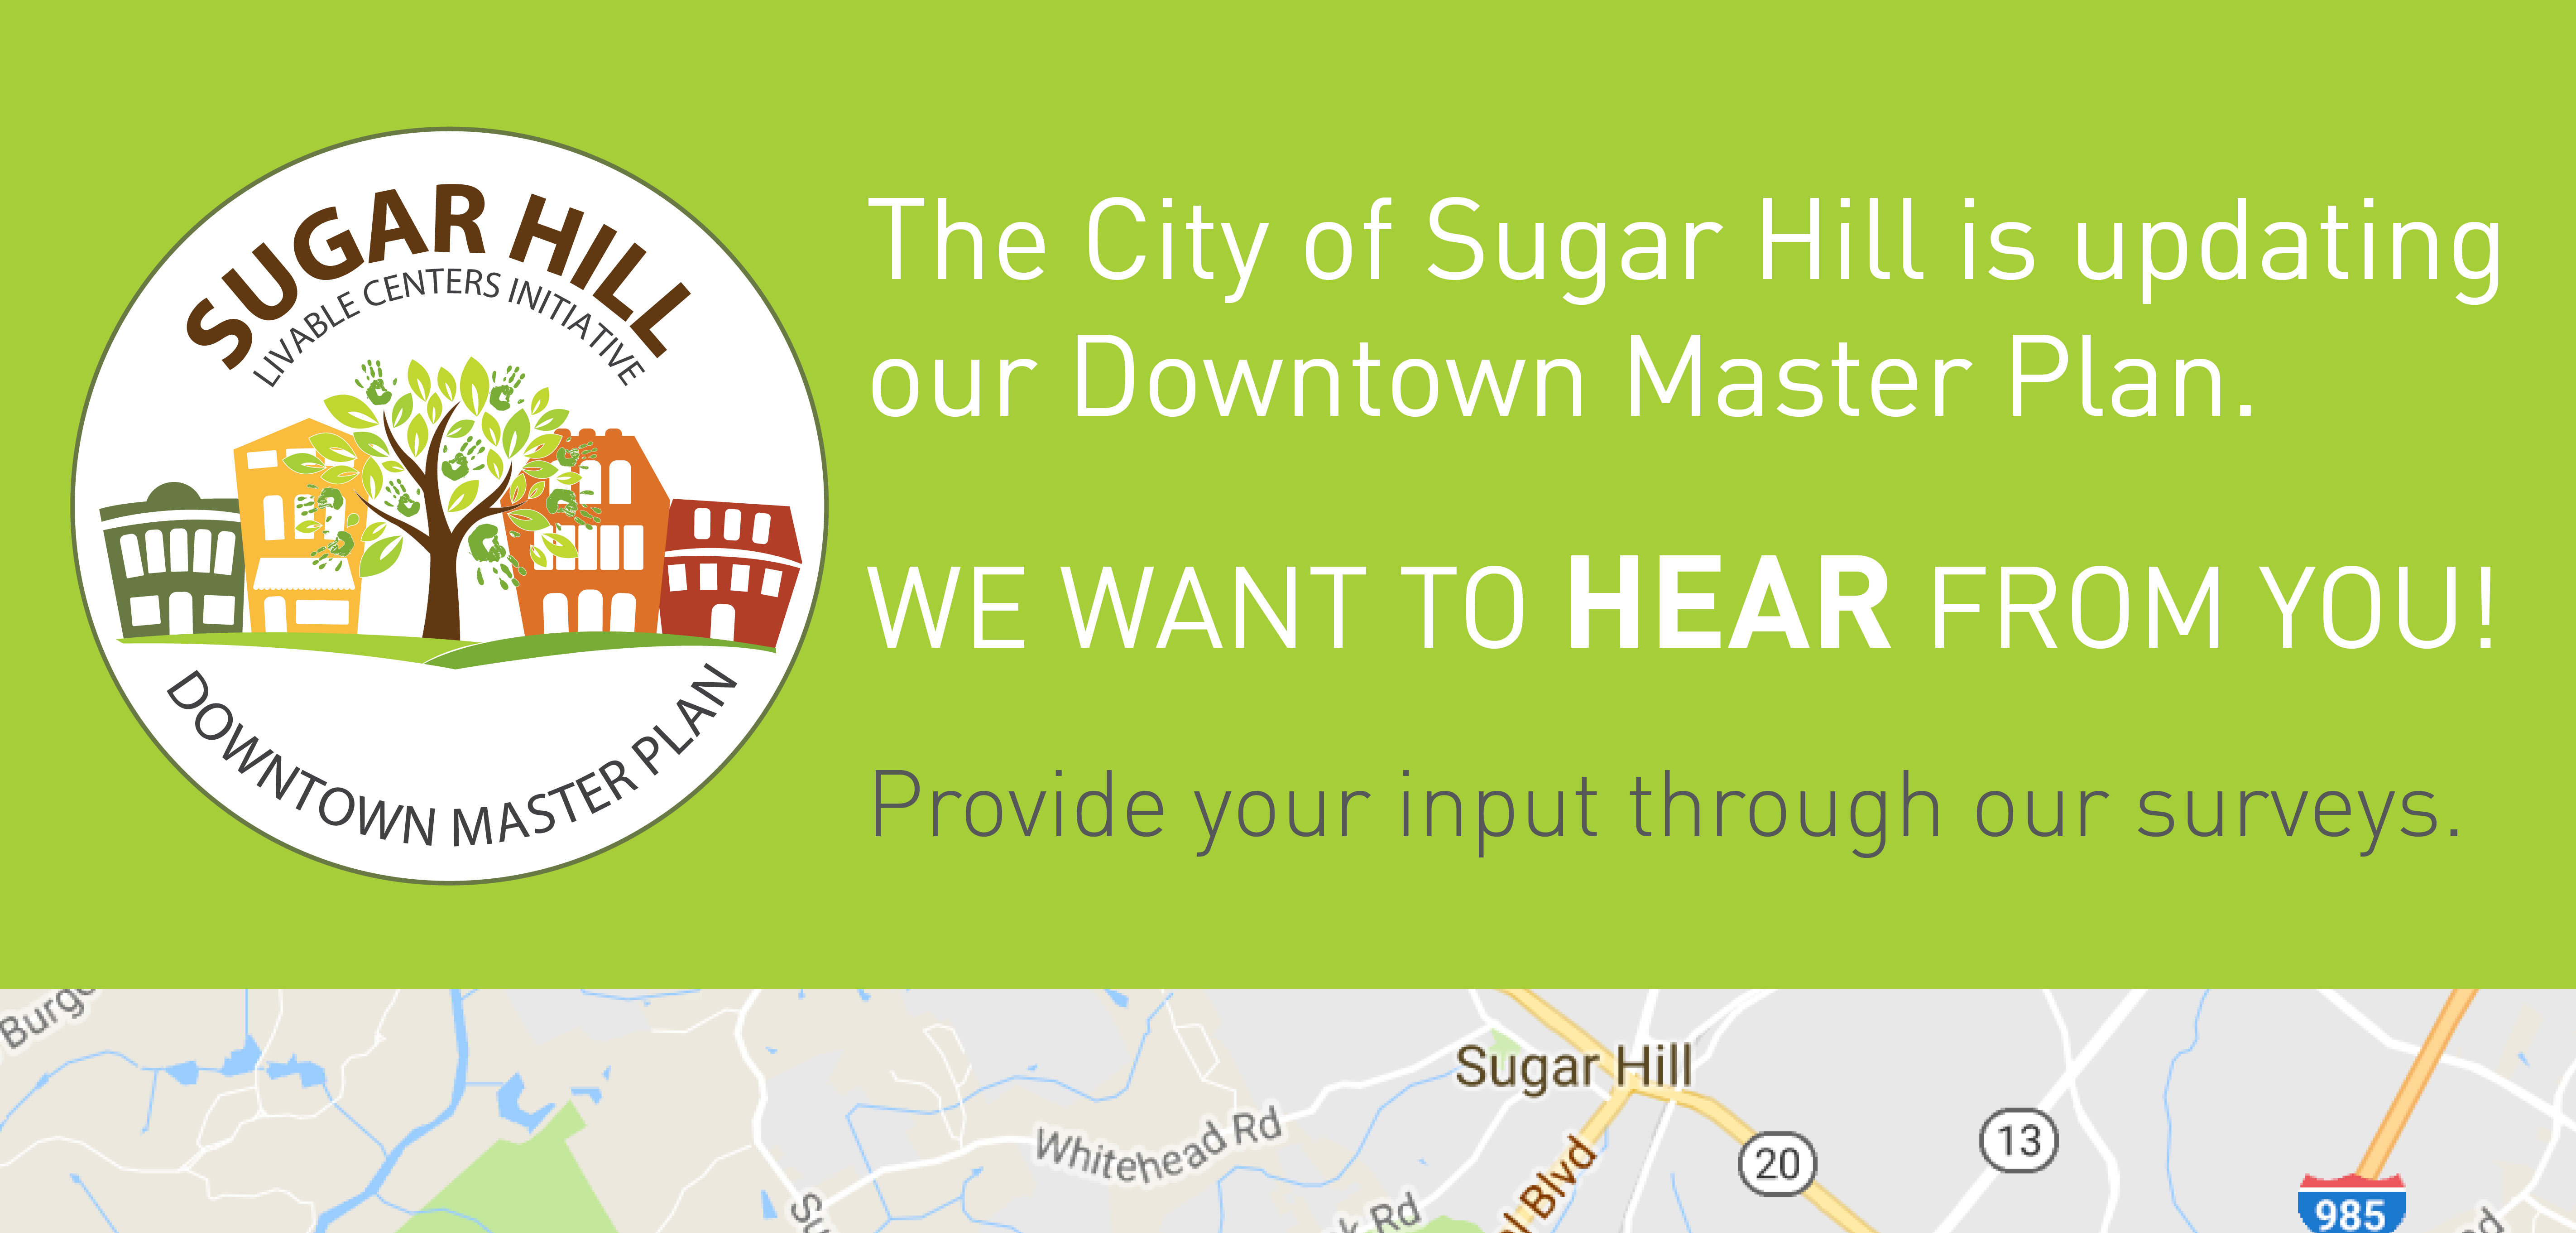 city of sugar hill u2014 the sweet life